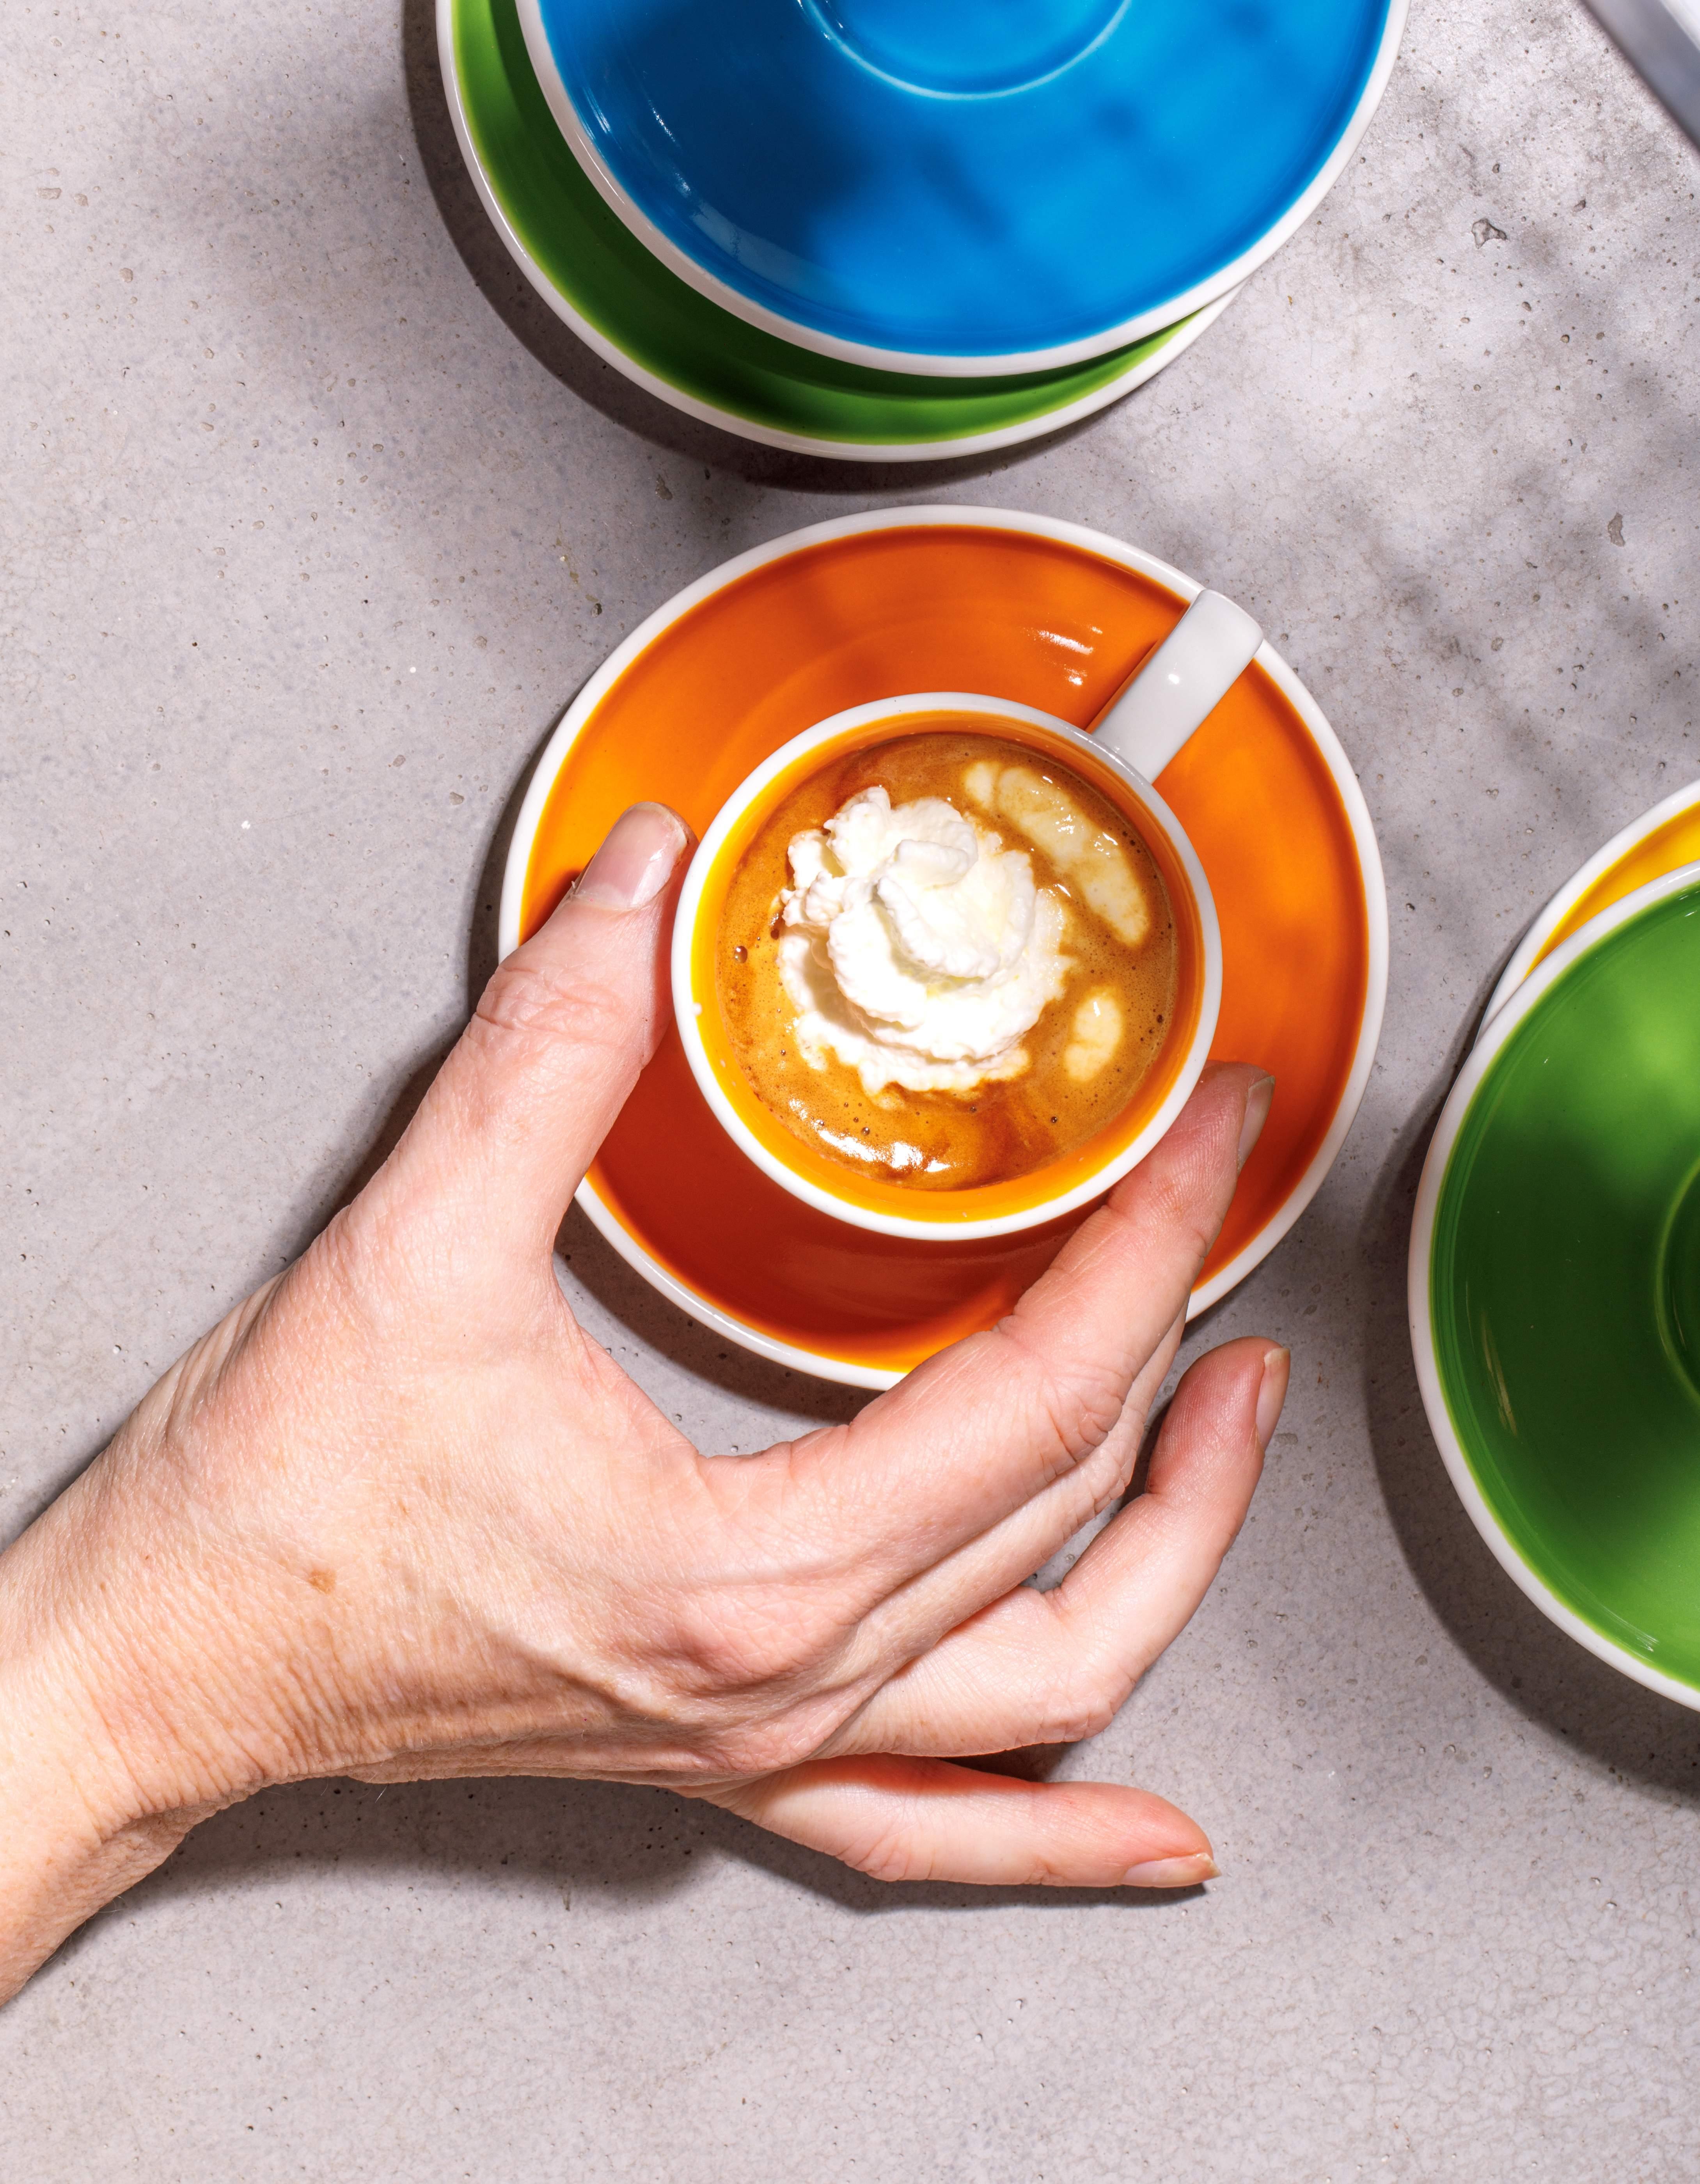 Espresso Con Panna from the Araku Coffee menu